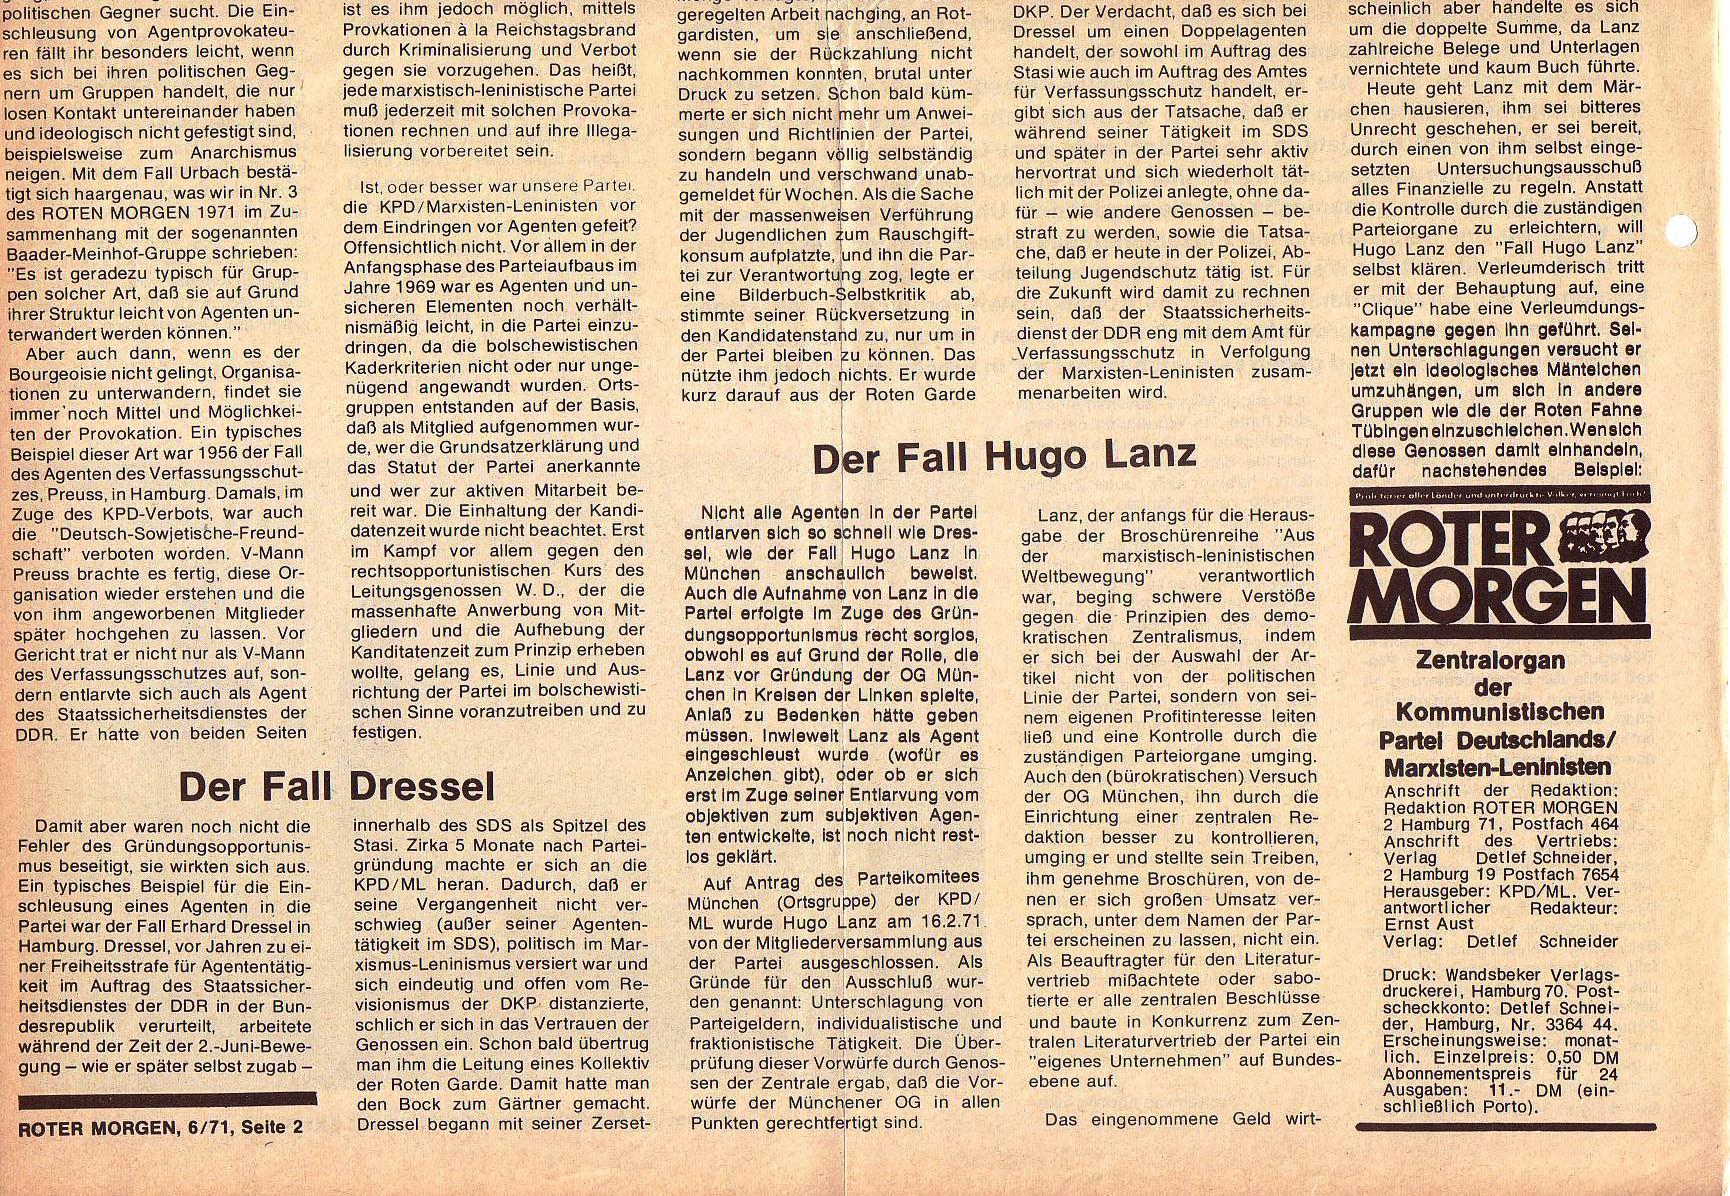 Roter Morgen, 5. Jg., Juni 1971, Nr. 6, Seite 2b